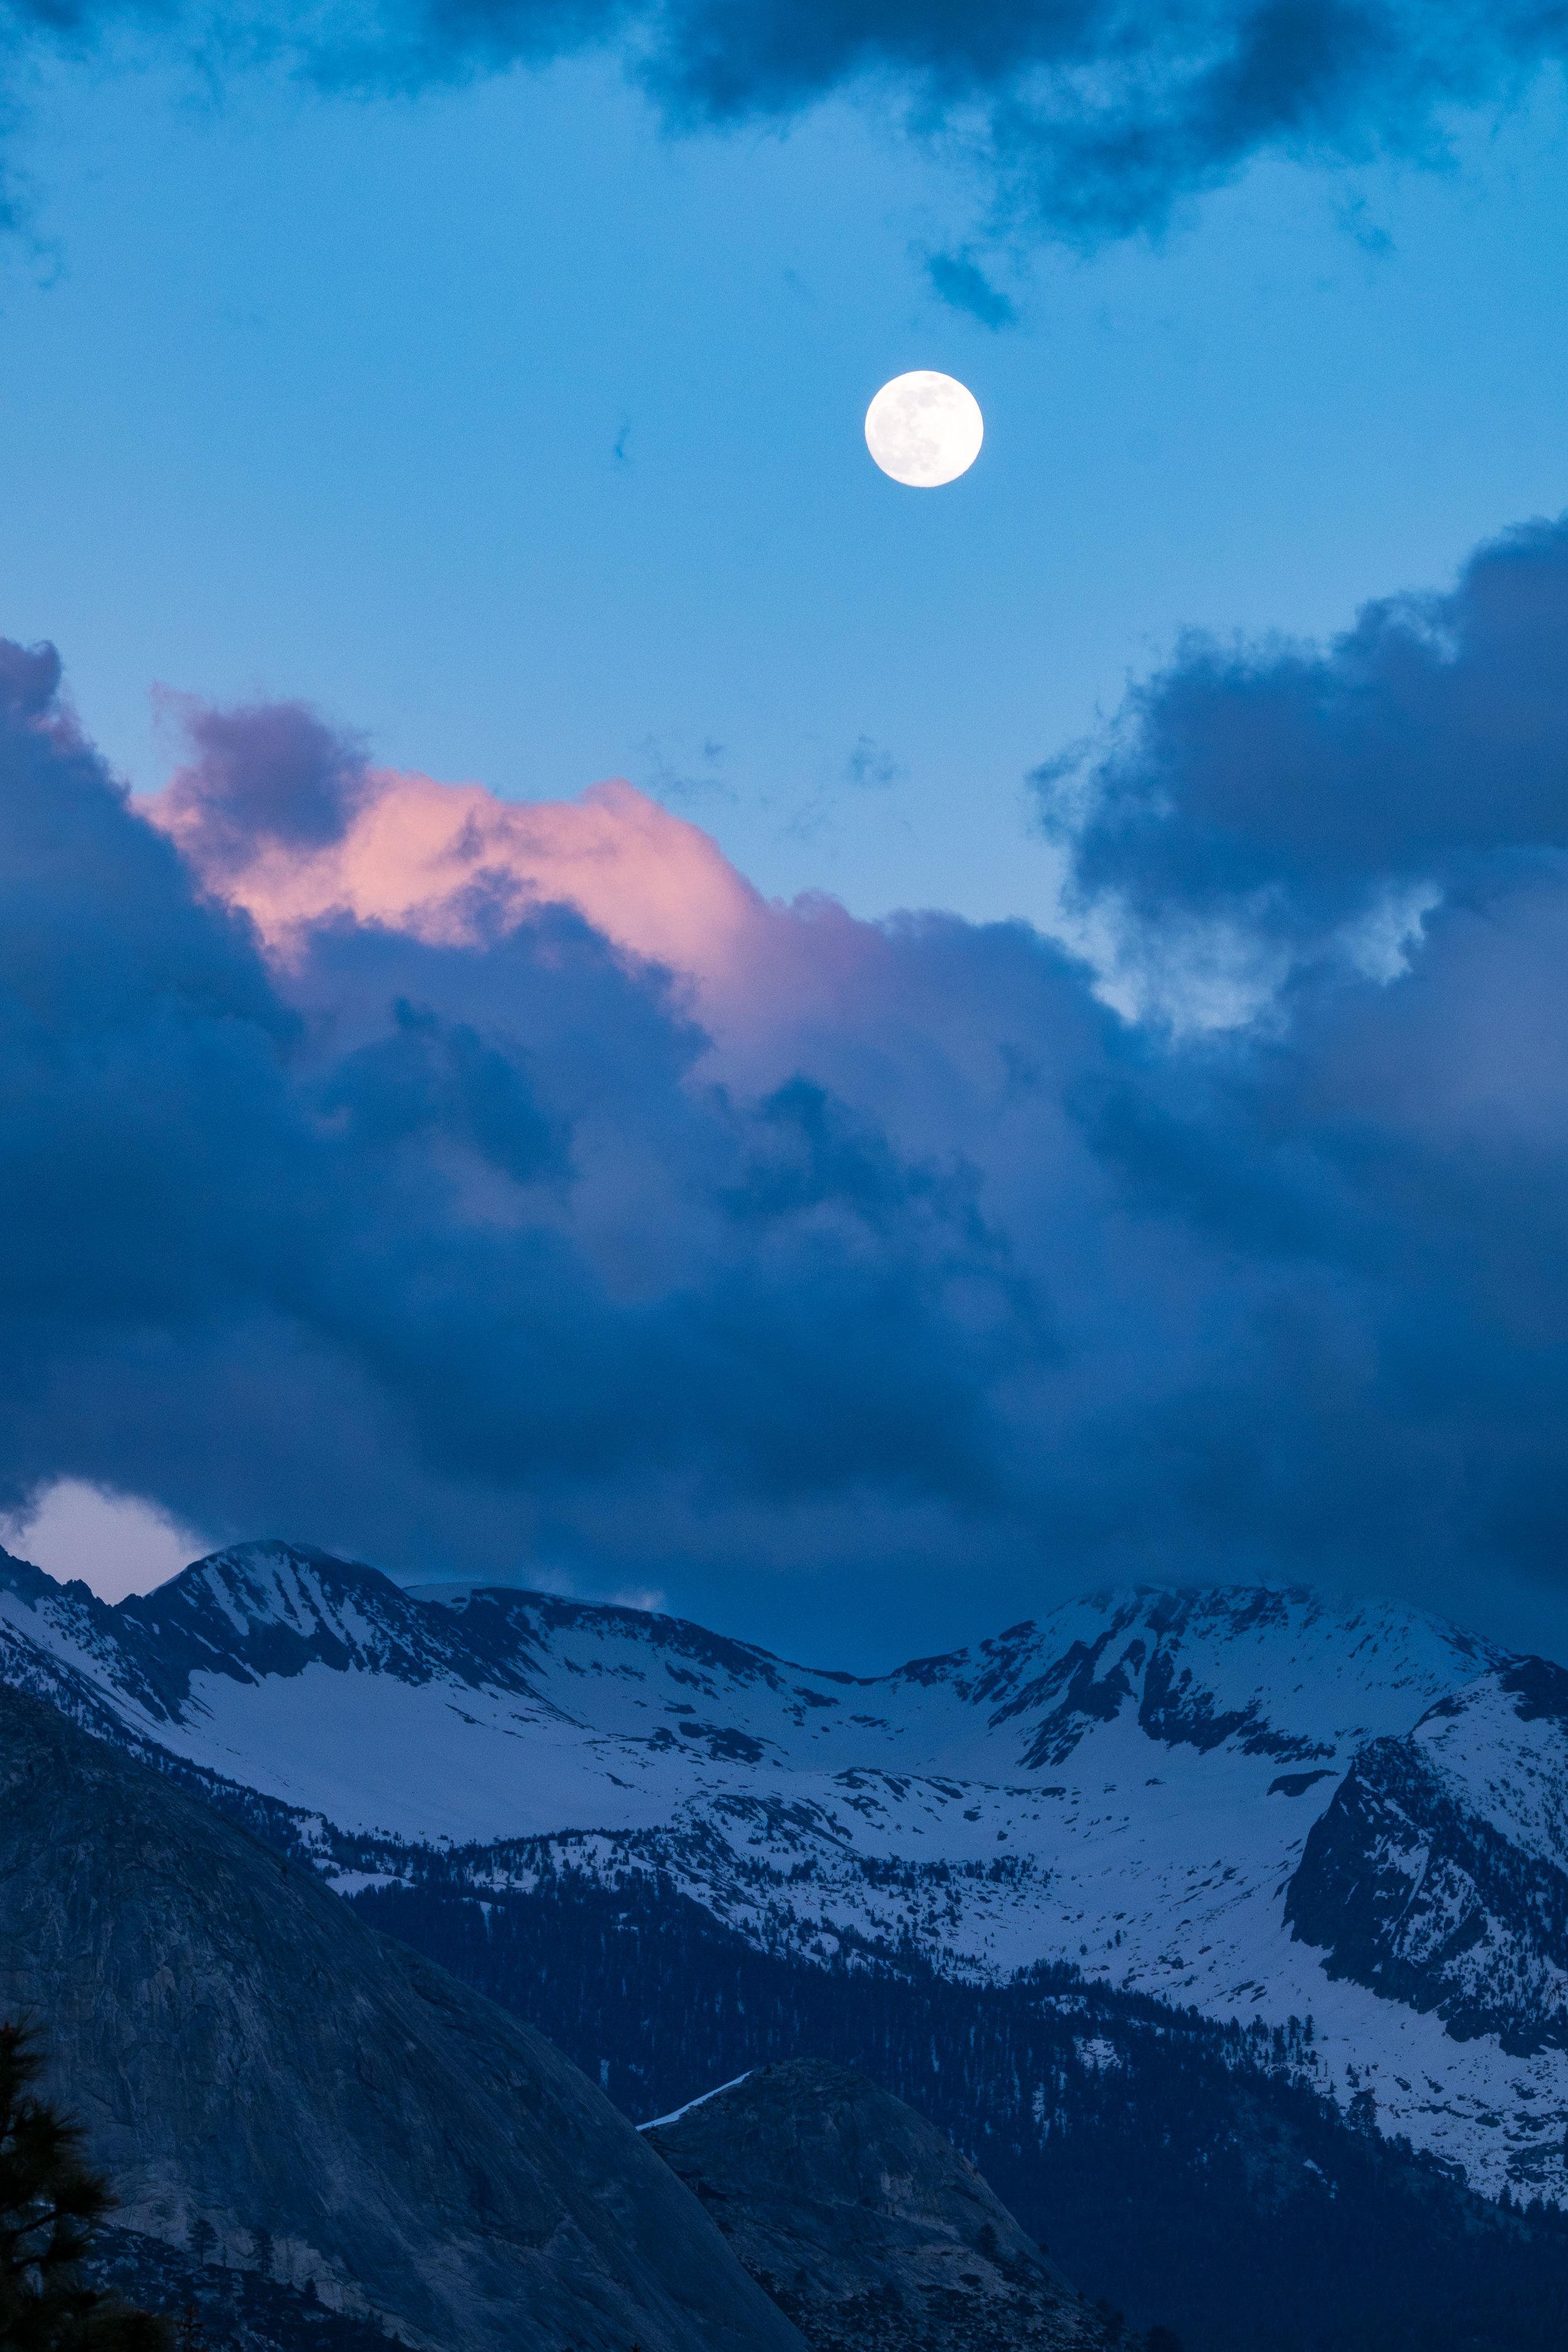 20160520-JI-Yosemite National Park-_DSF7347.jpg